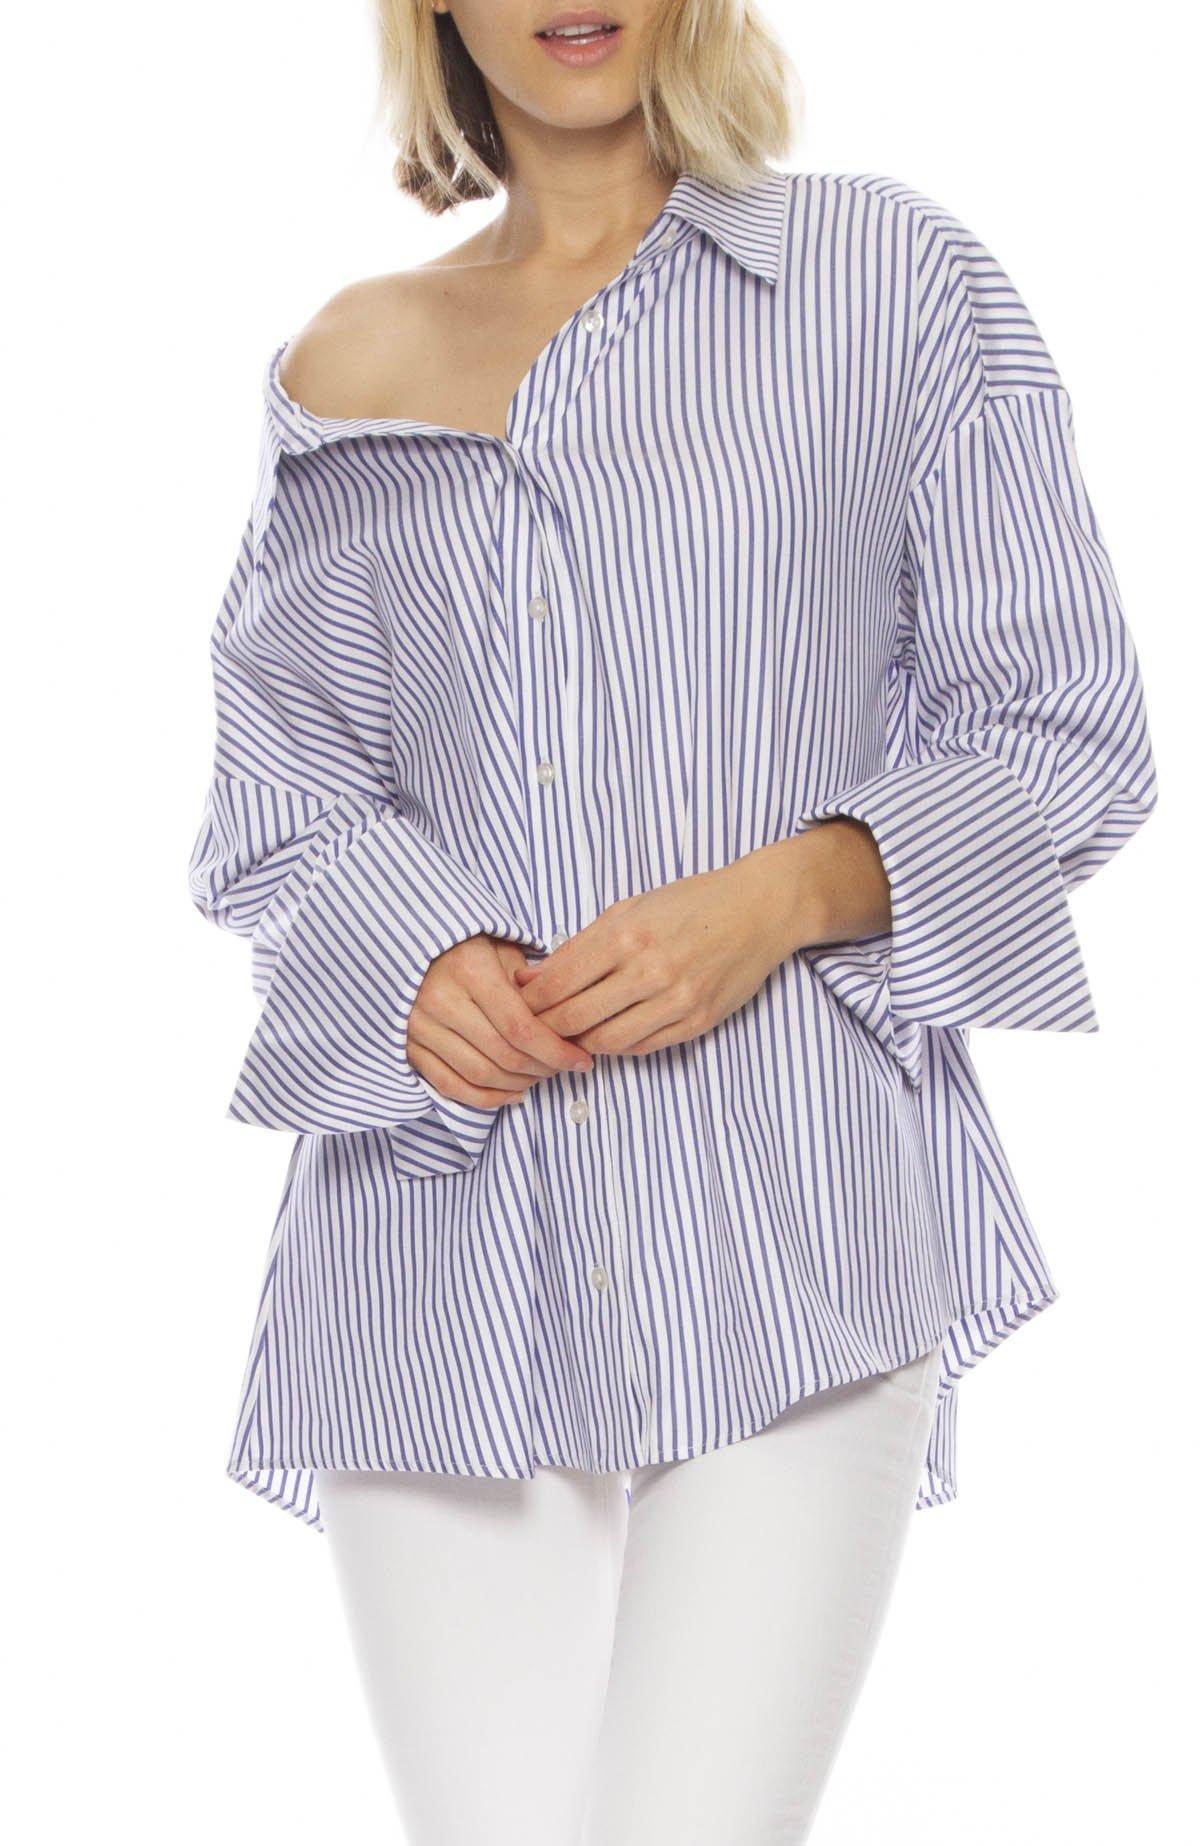 b6dfe7bbe03573 Caroline Constas Newell Cotton Top - Blue/White   Garmentory